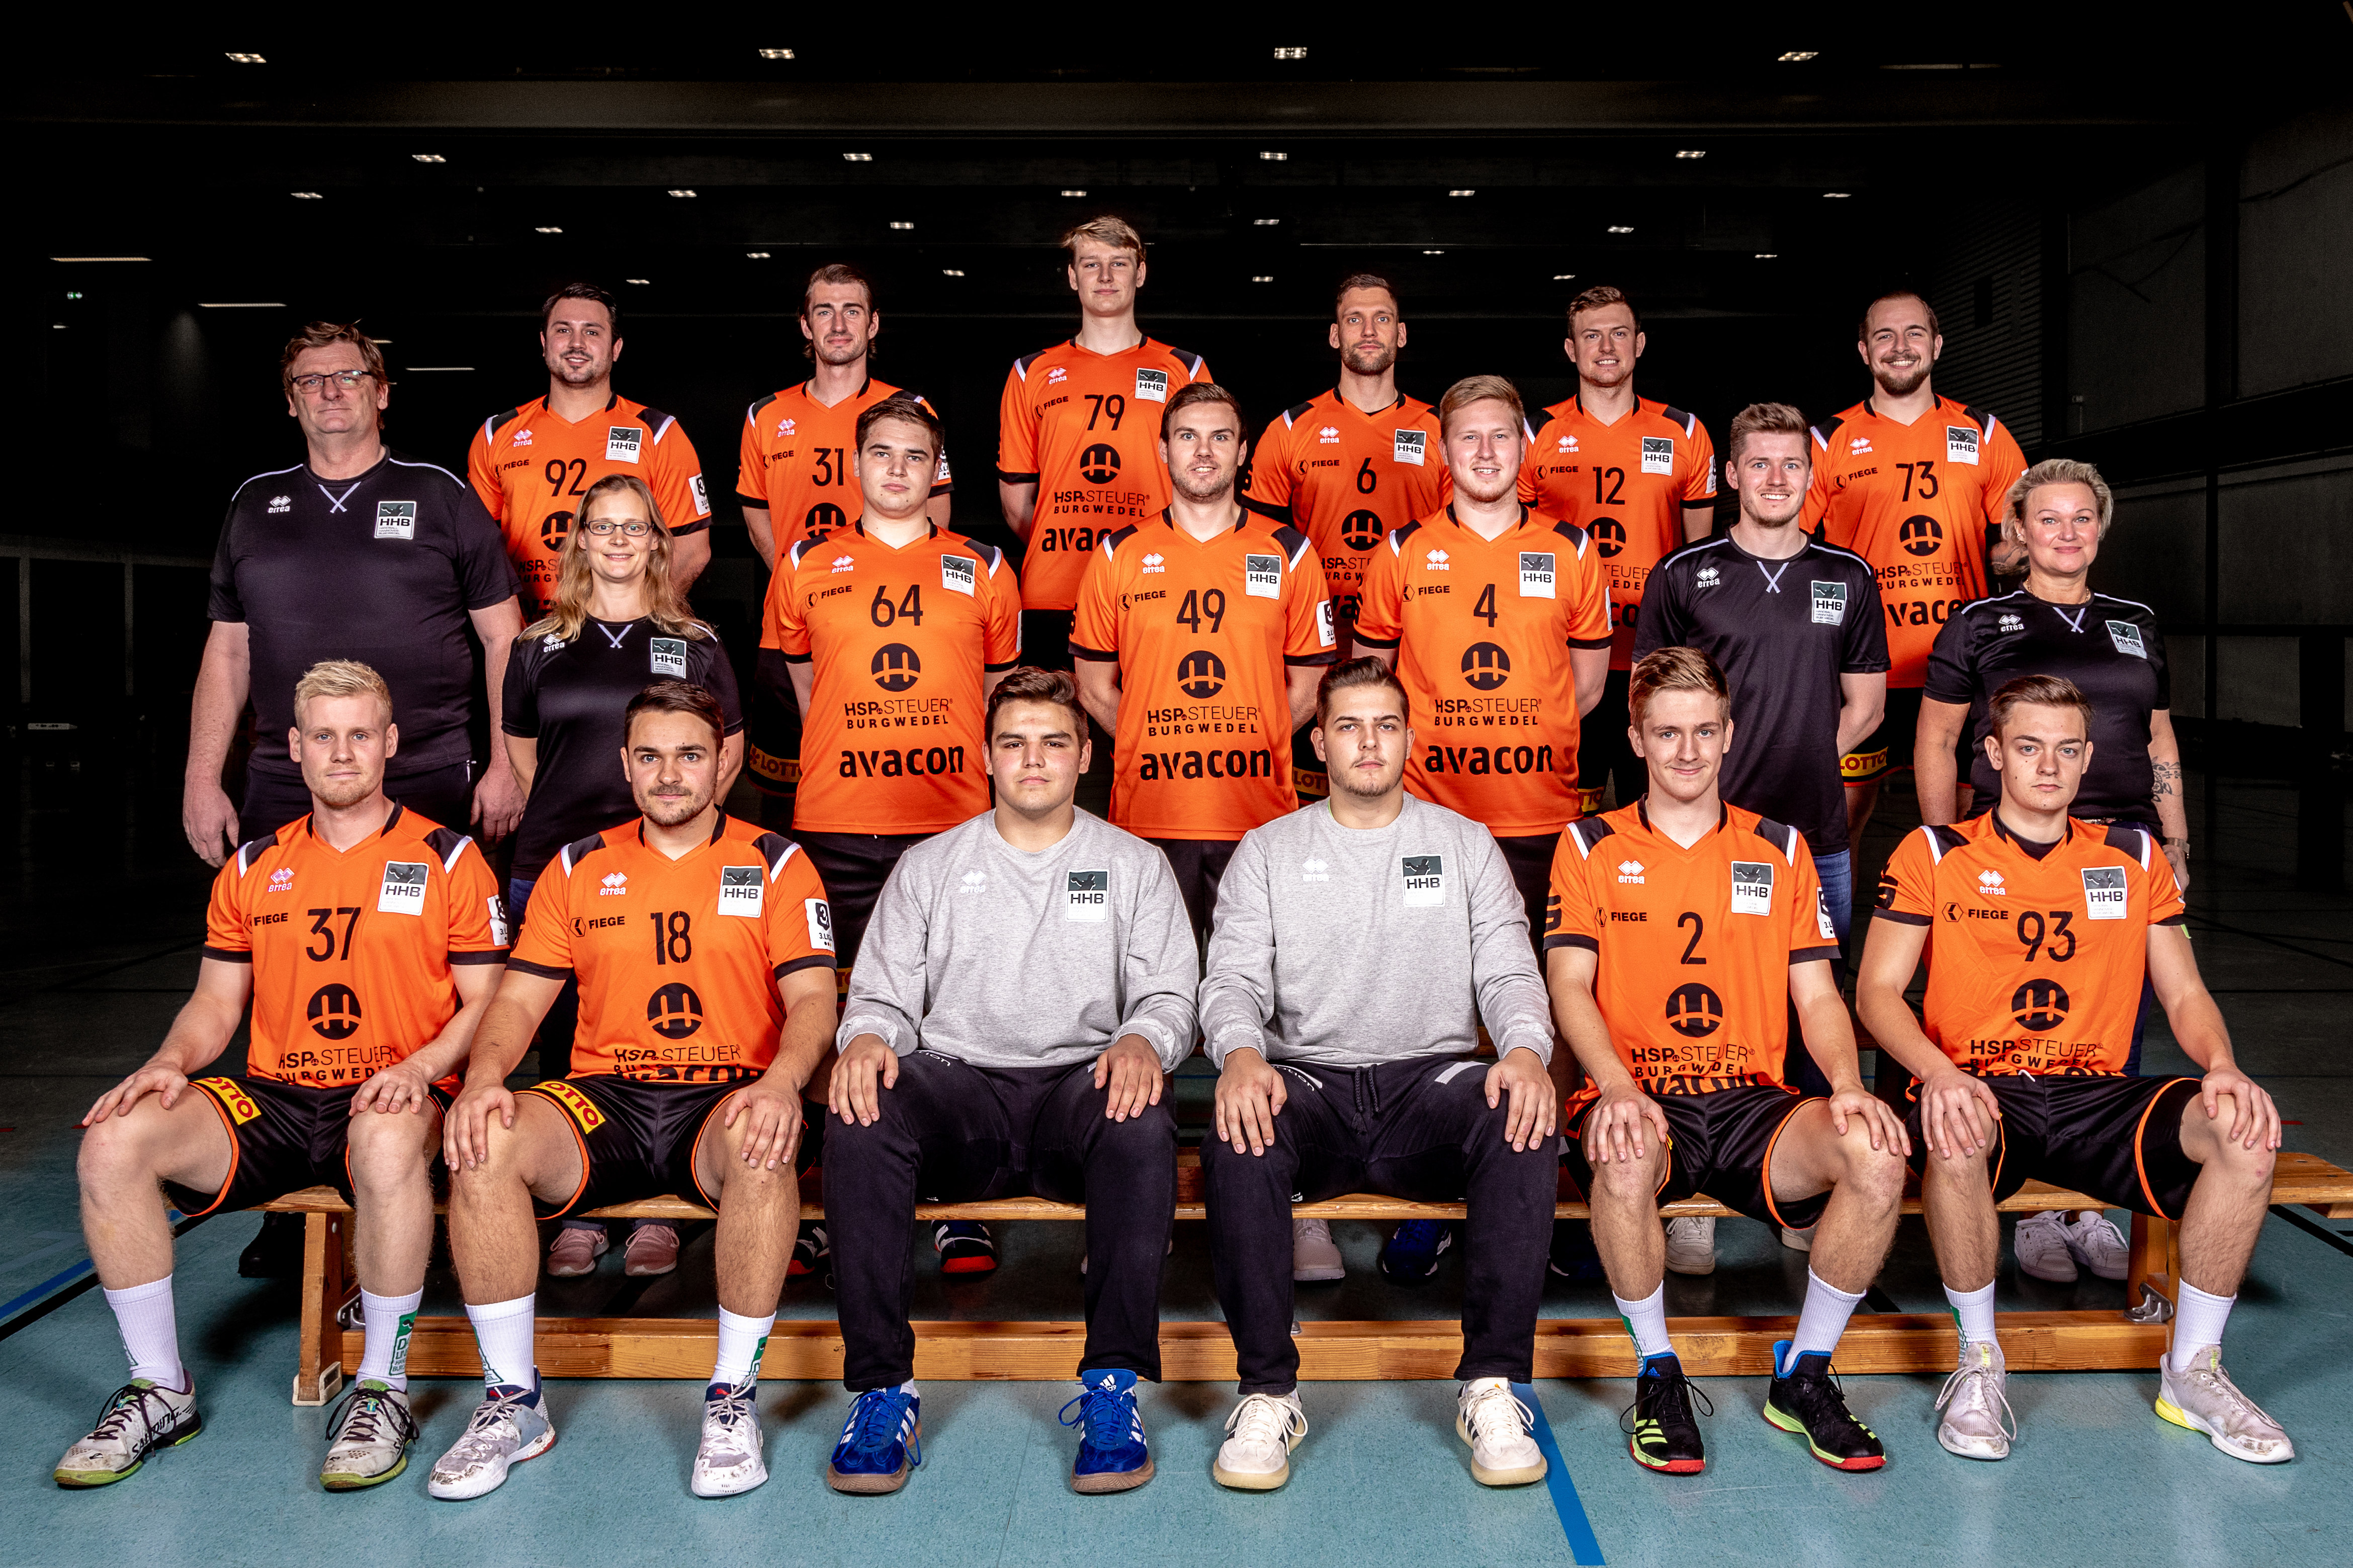 Handball Burgwedel